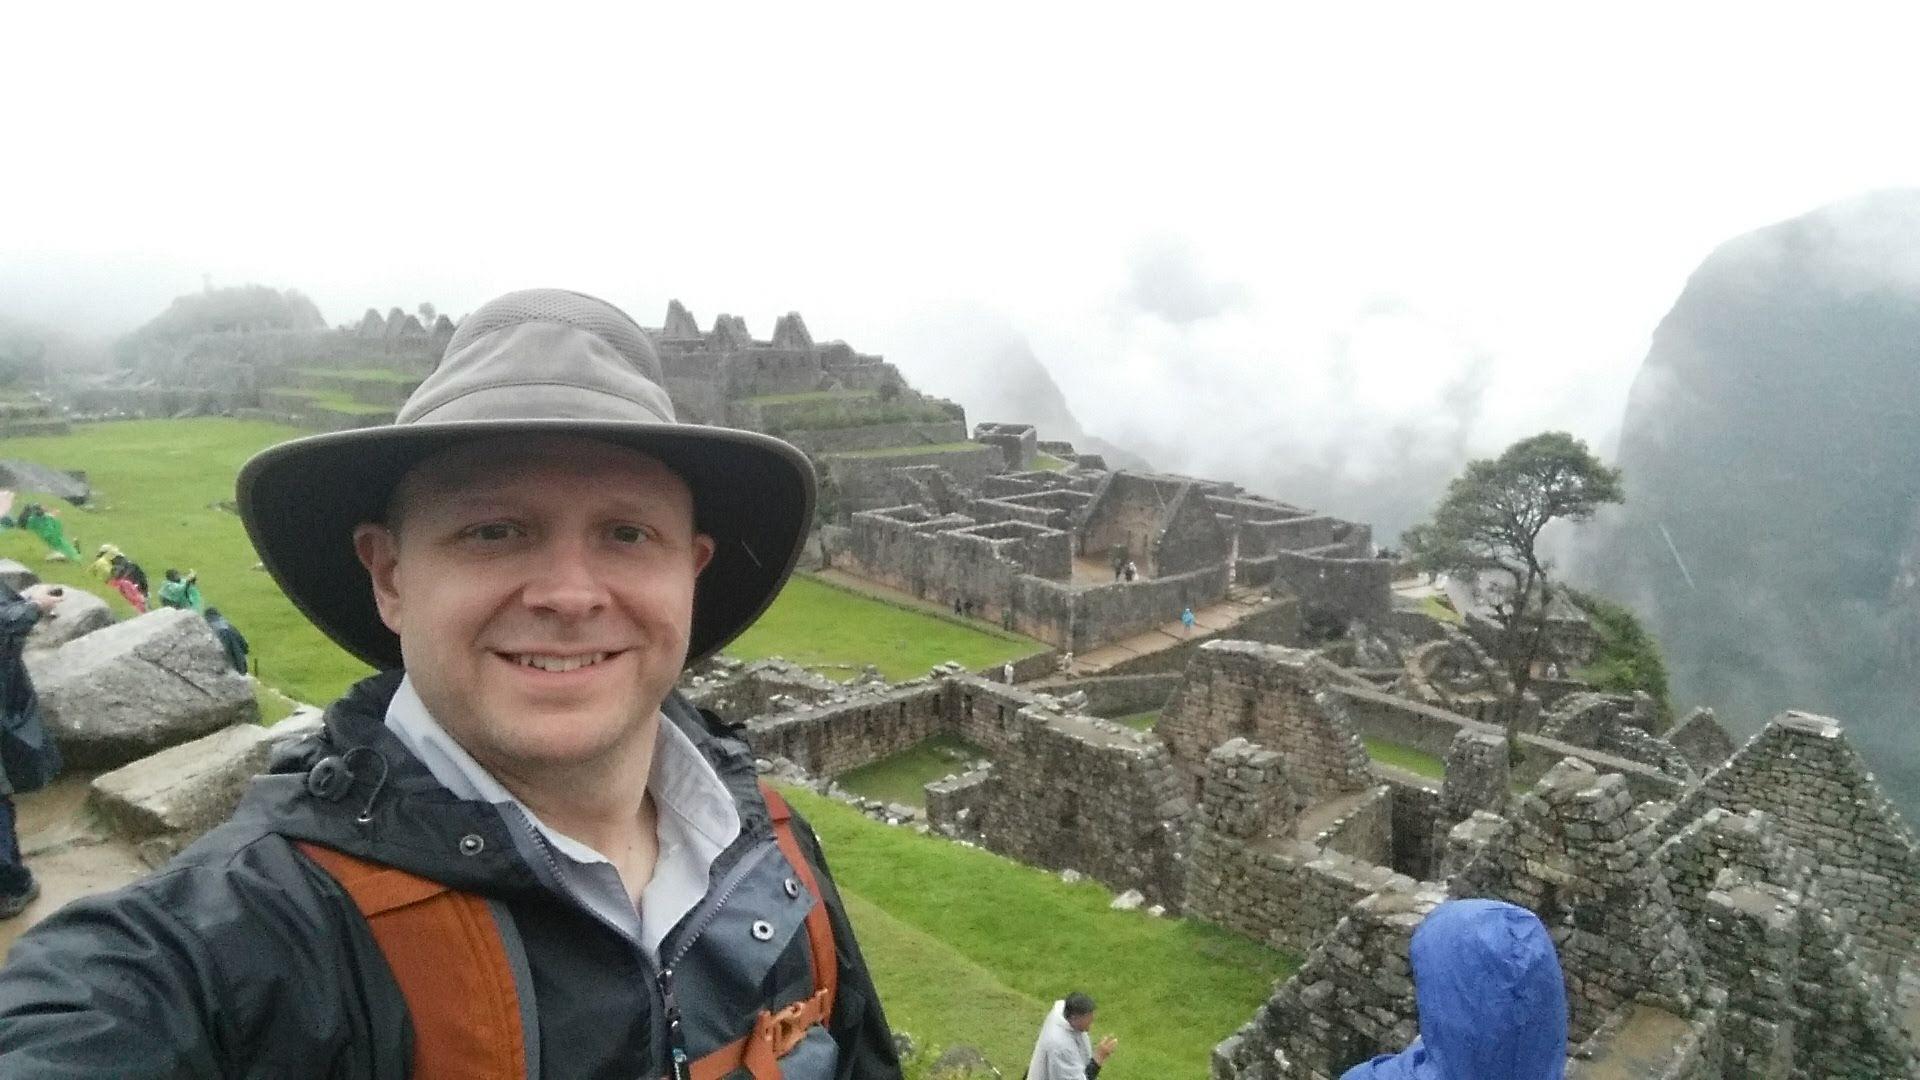 Bill adventuring at Machu Picchu